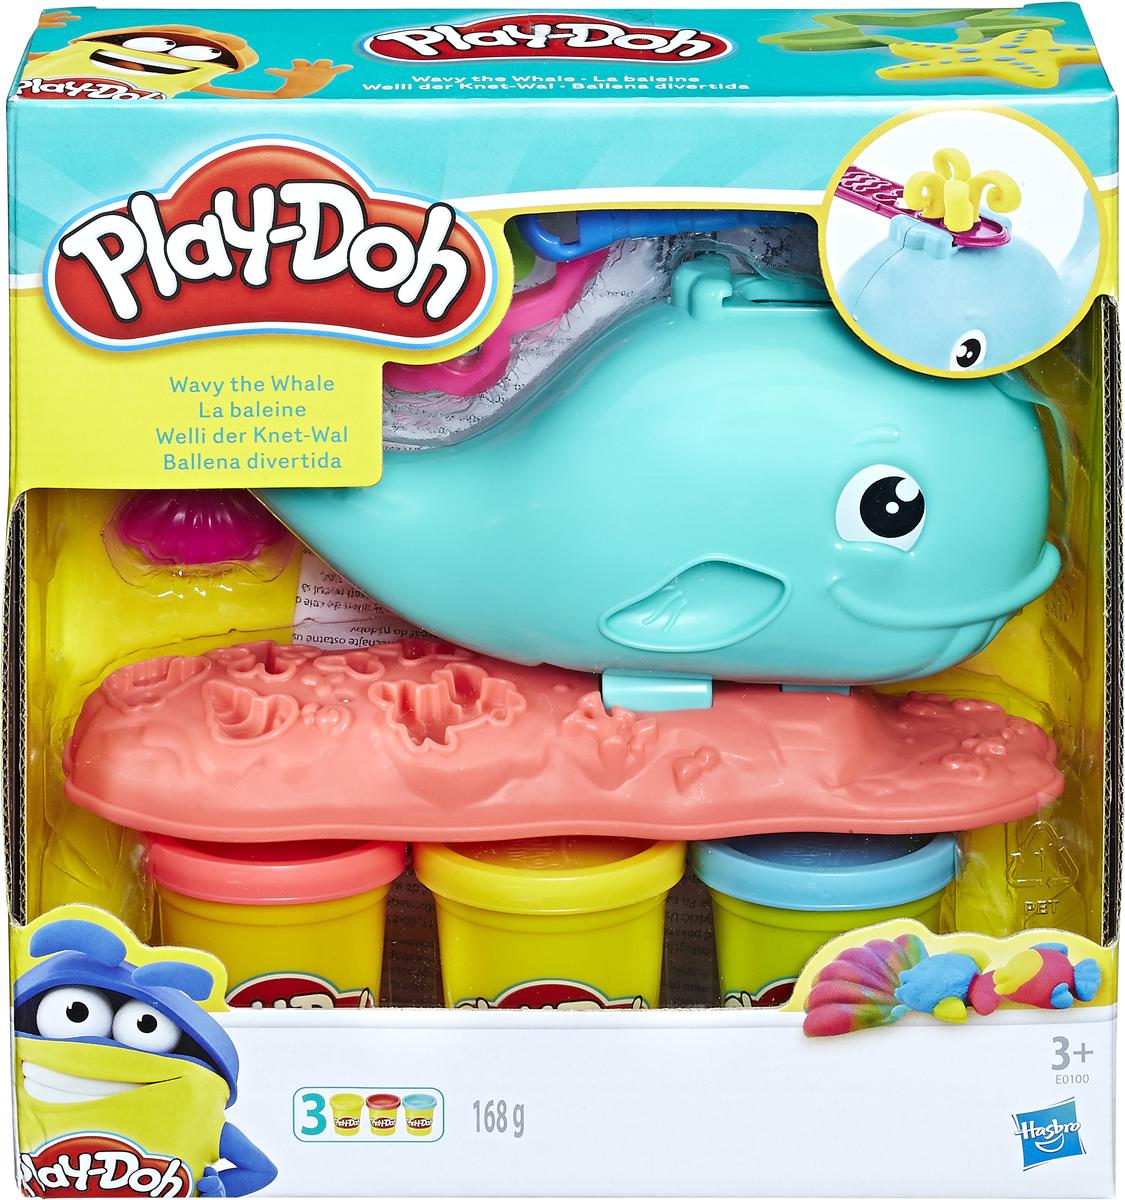 Набор для лепки Play-Doh Kitchen Creations Забавный китенок, E0100EU4 Play-Doh